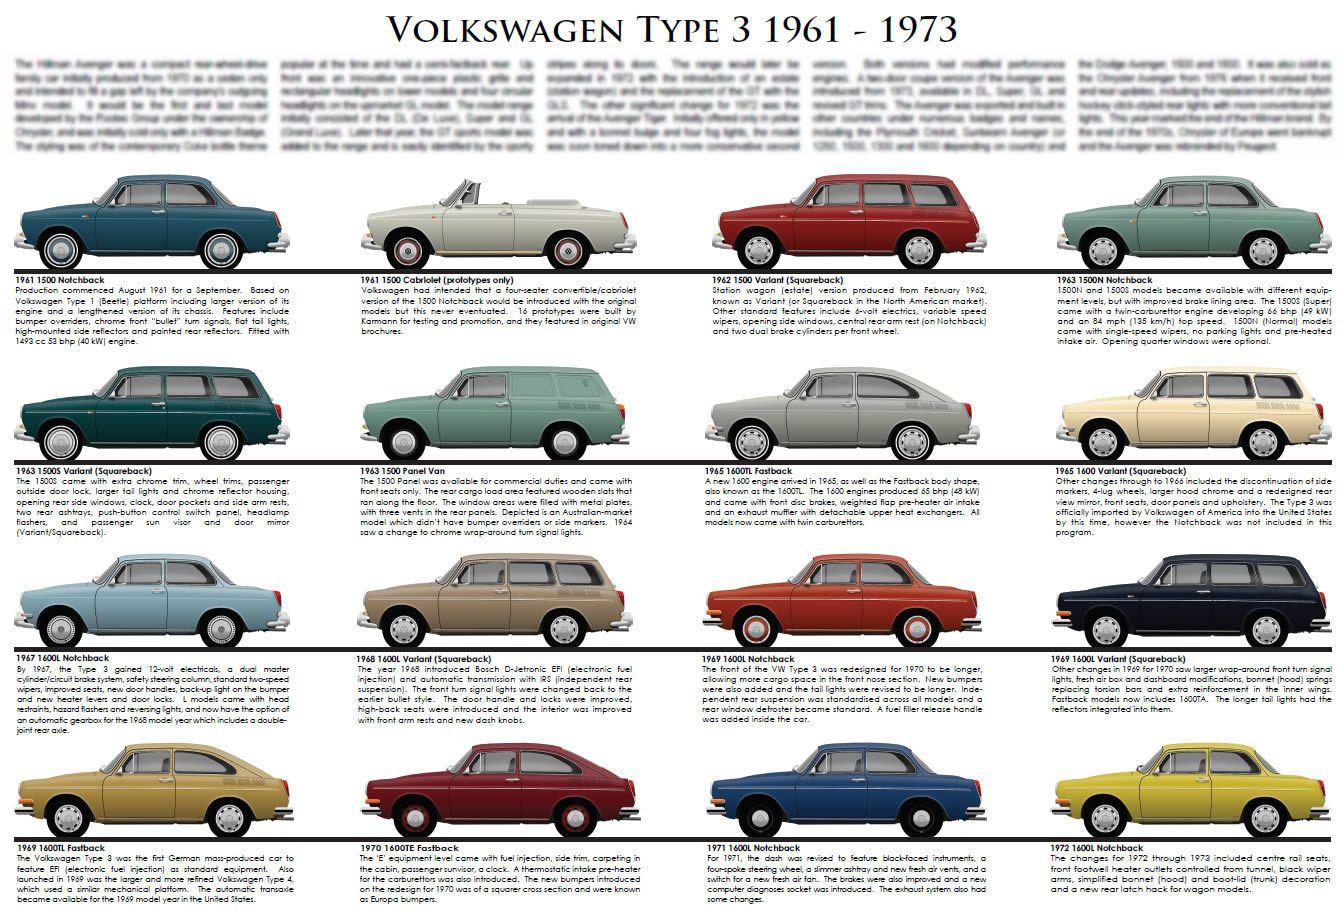 Volkswagen Type 3 Model Chart 1961 1973 Vw 1500 1600 Notchback